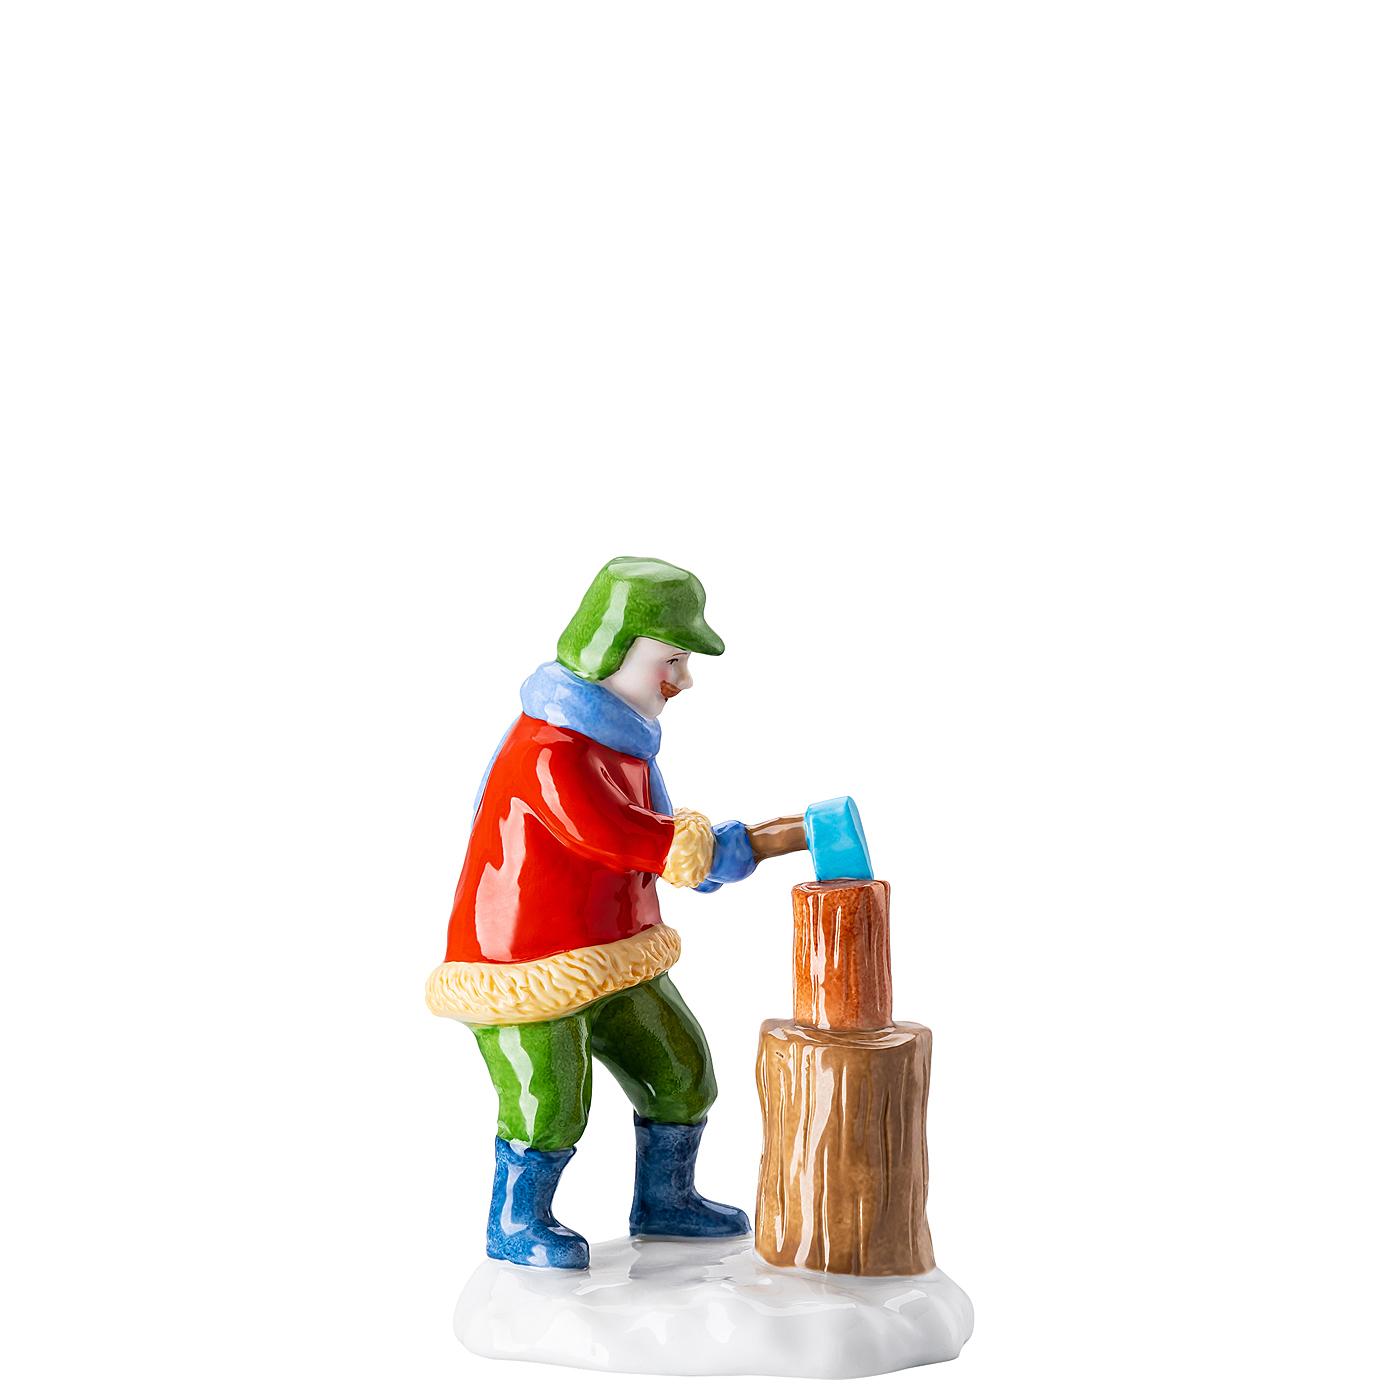 Holzfäller Figuren Weihnachtsbäckerei Hutschenreuther